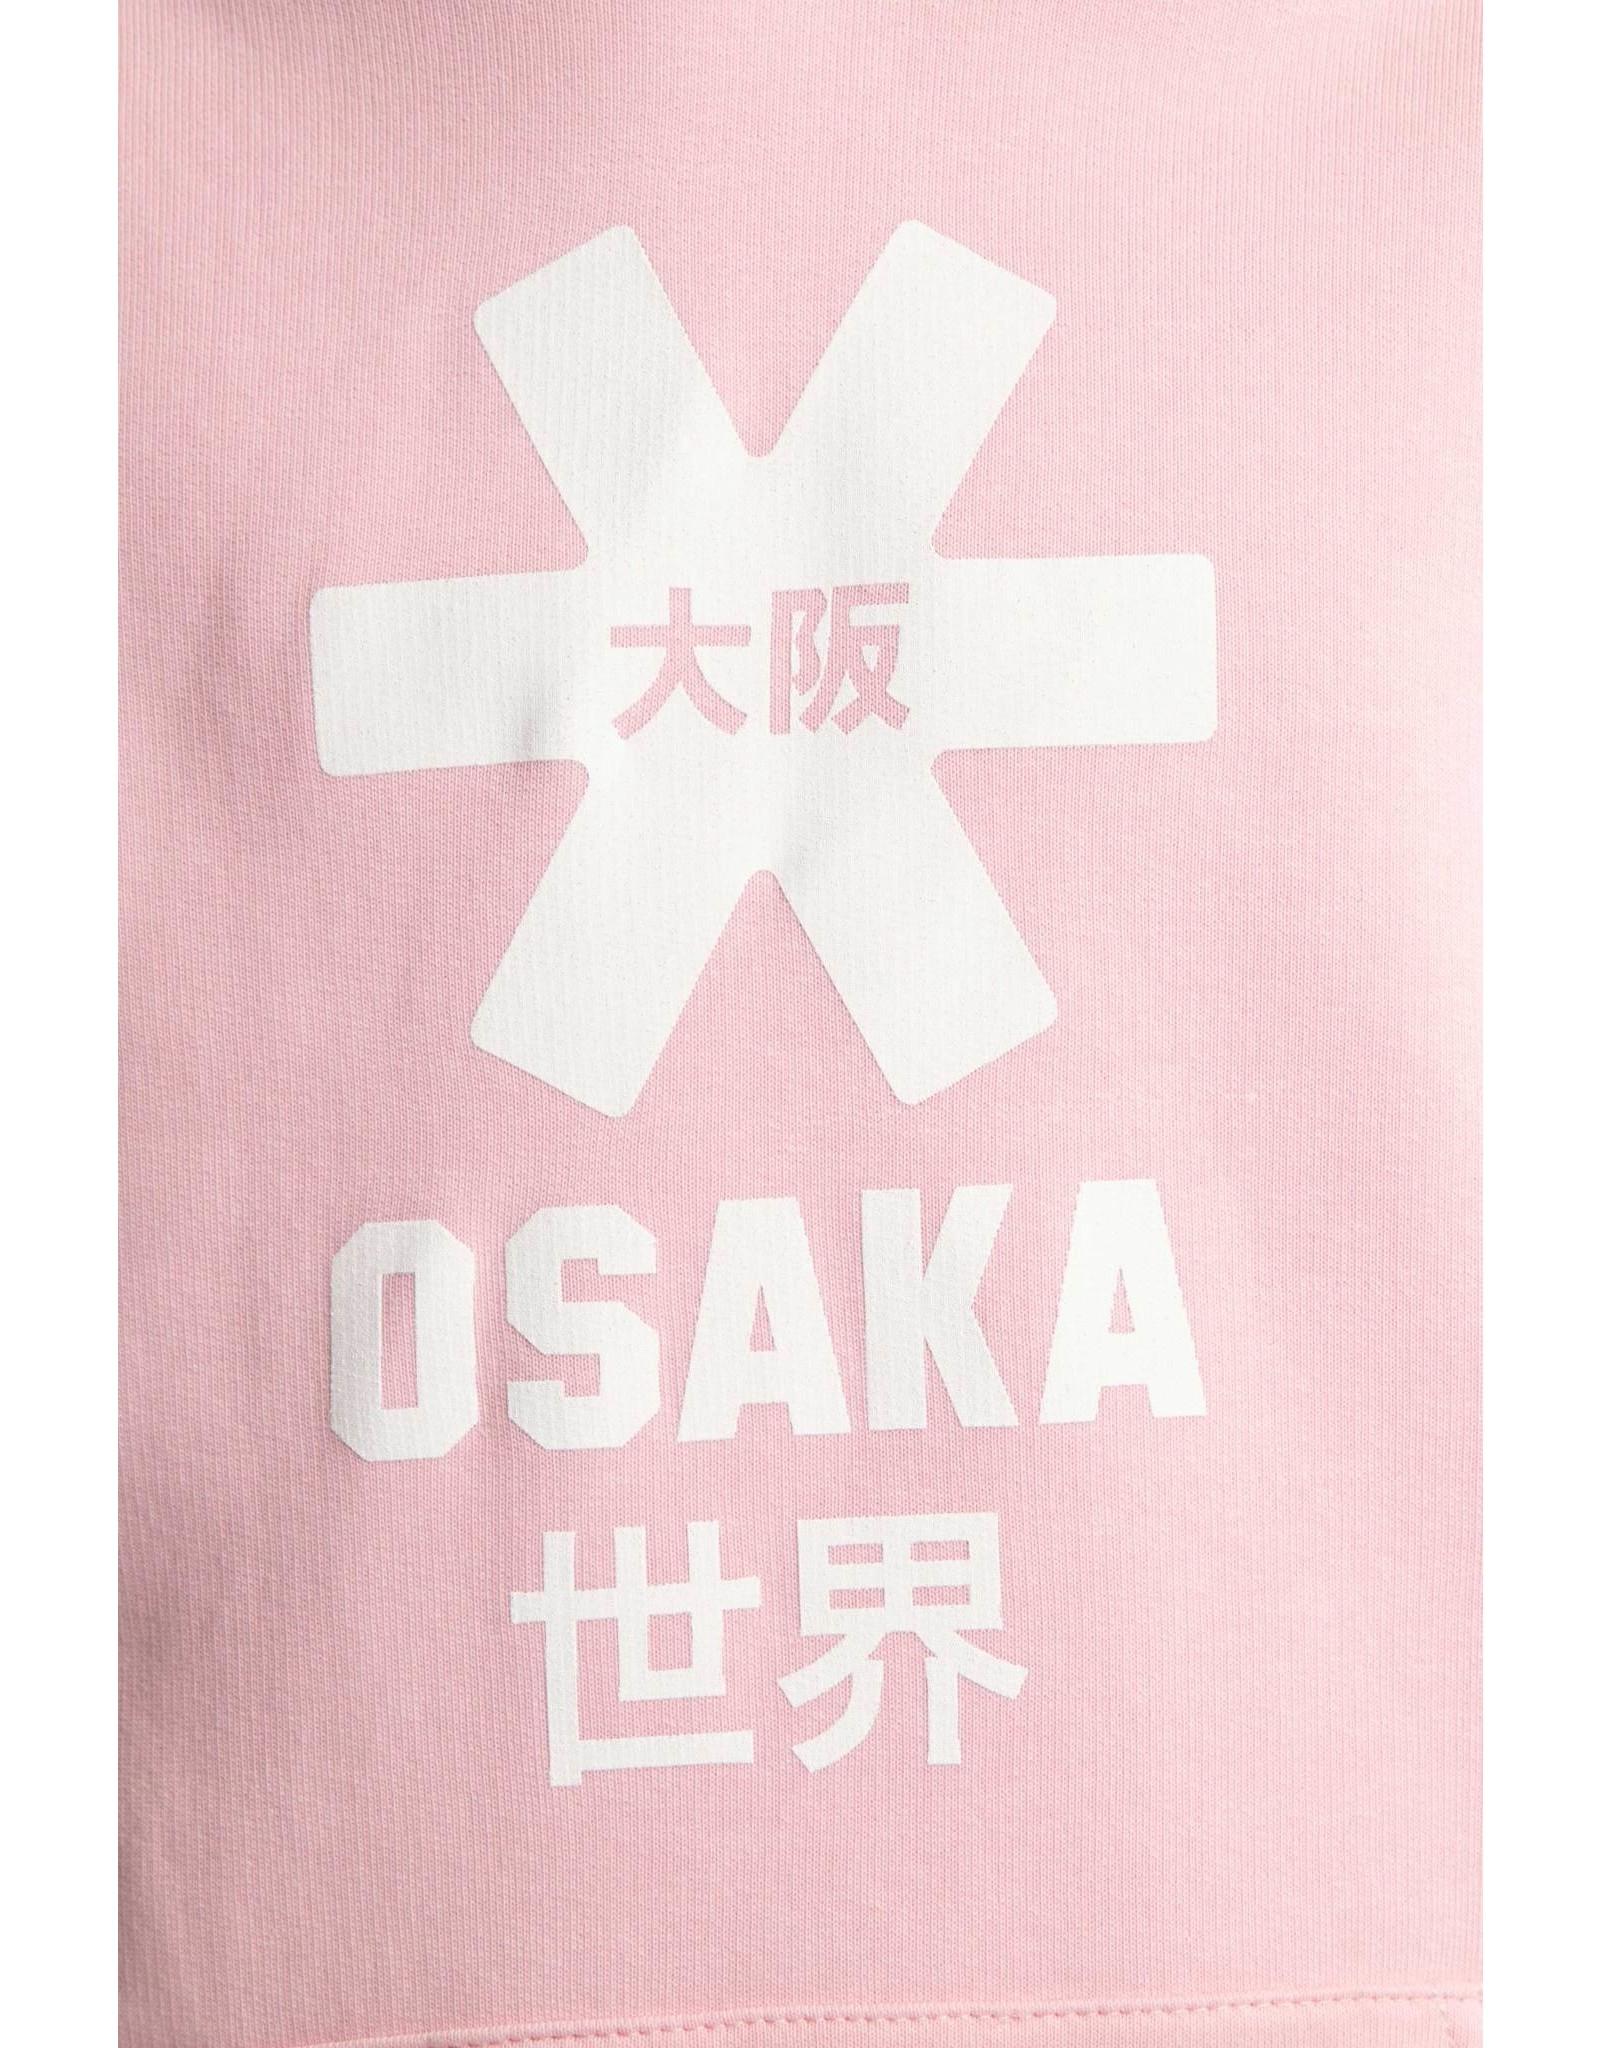 OSAKA OSAKA DESHI HOODIE WHITE STAR 20-21 COTTON PINK